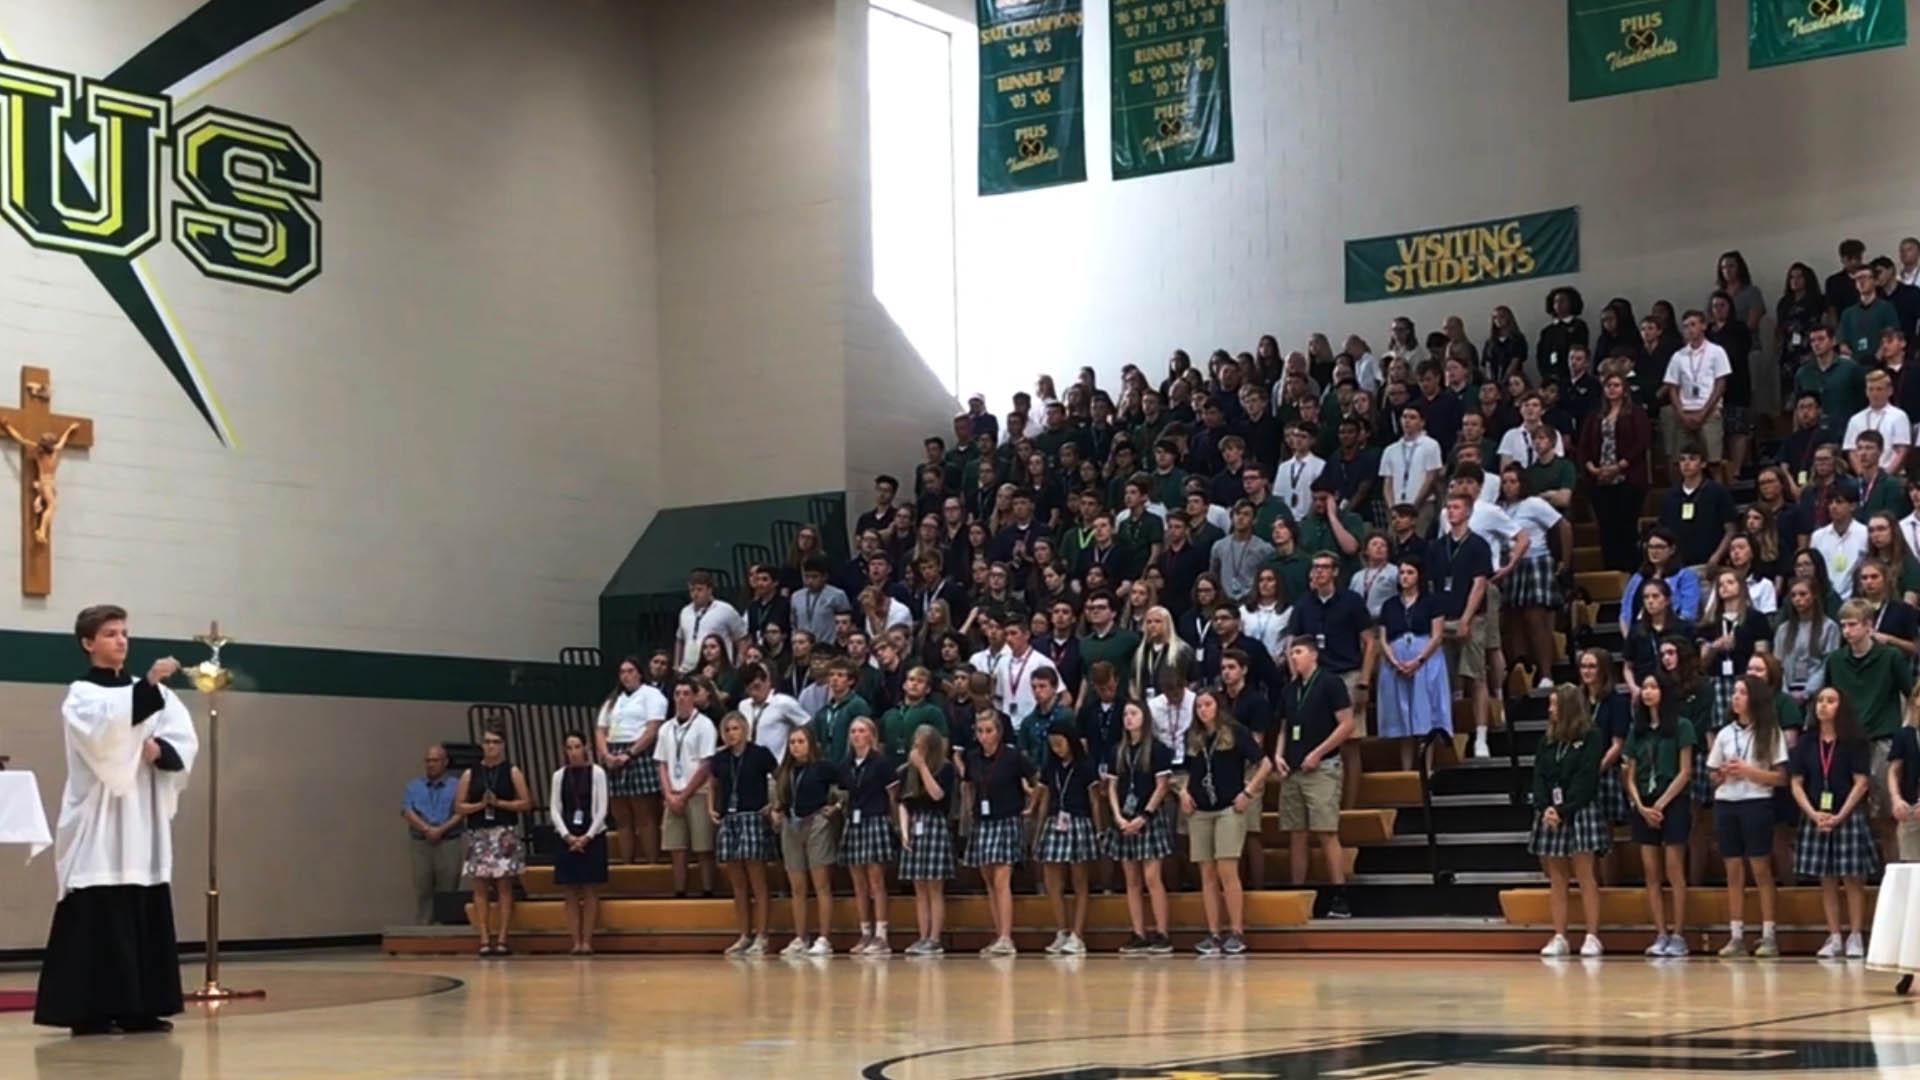 Lincoln Pius X Catholic High School